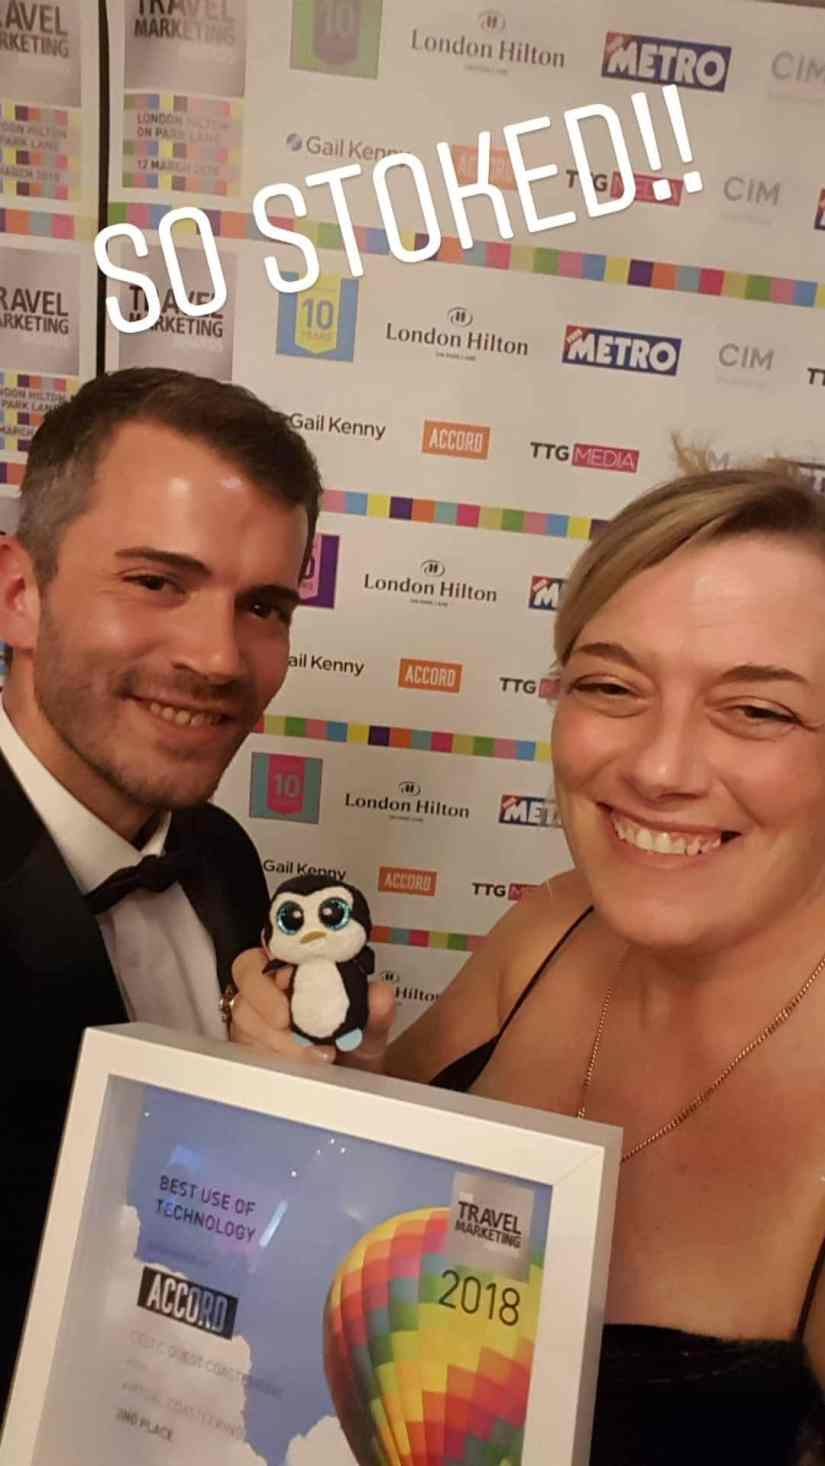 TTMA18-travel-marketing-awards-2018-6